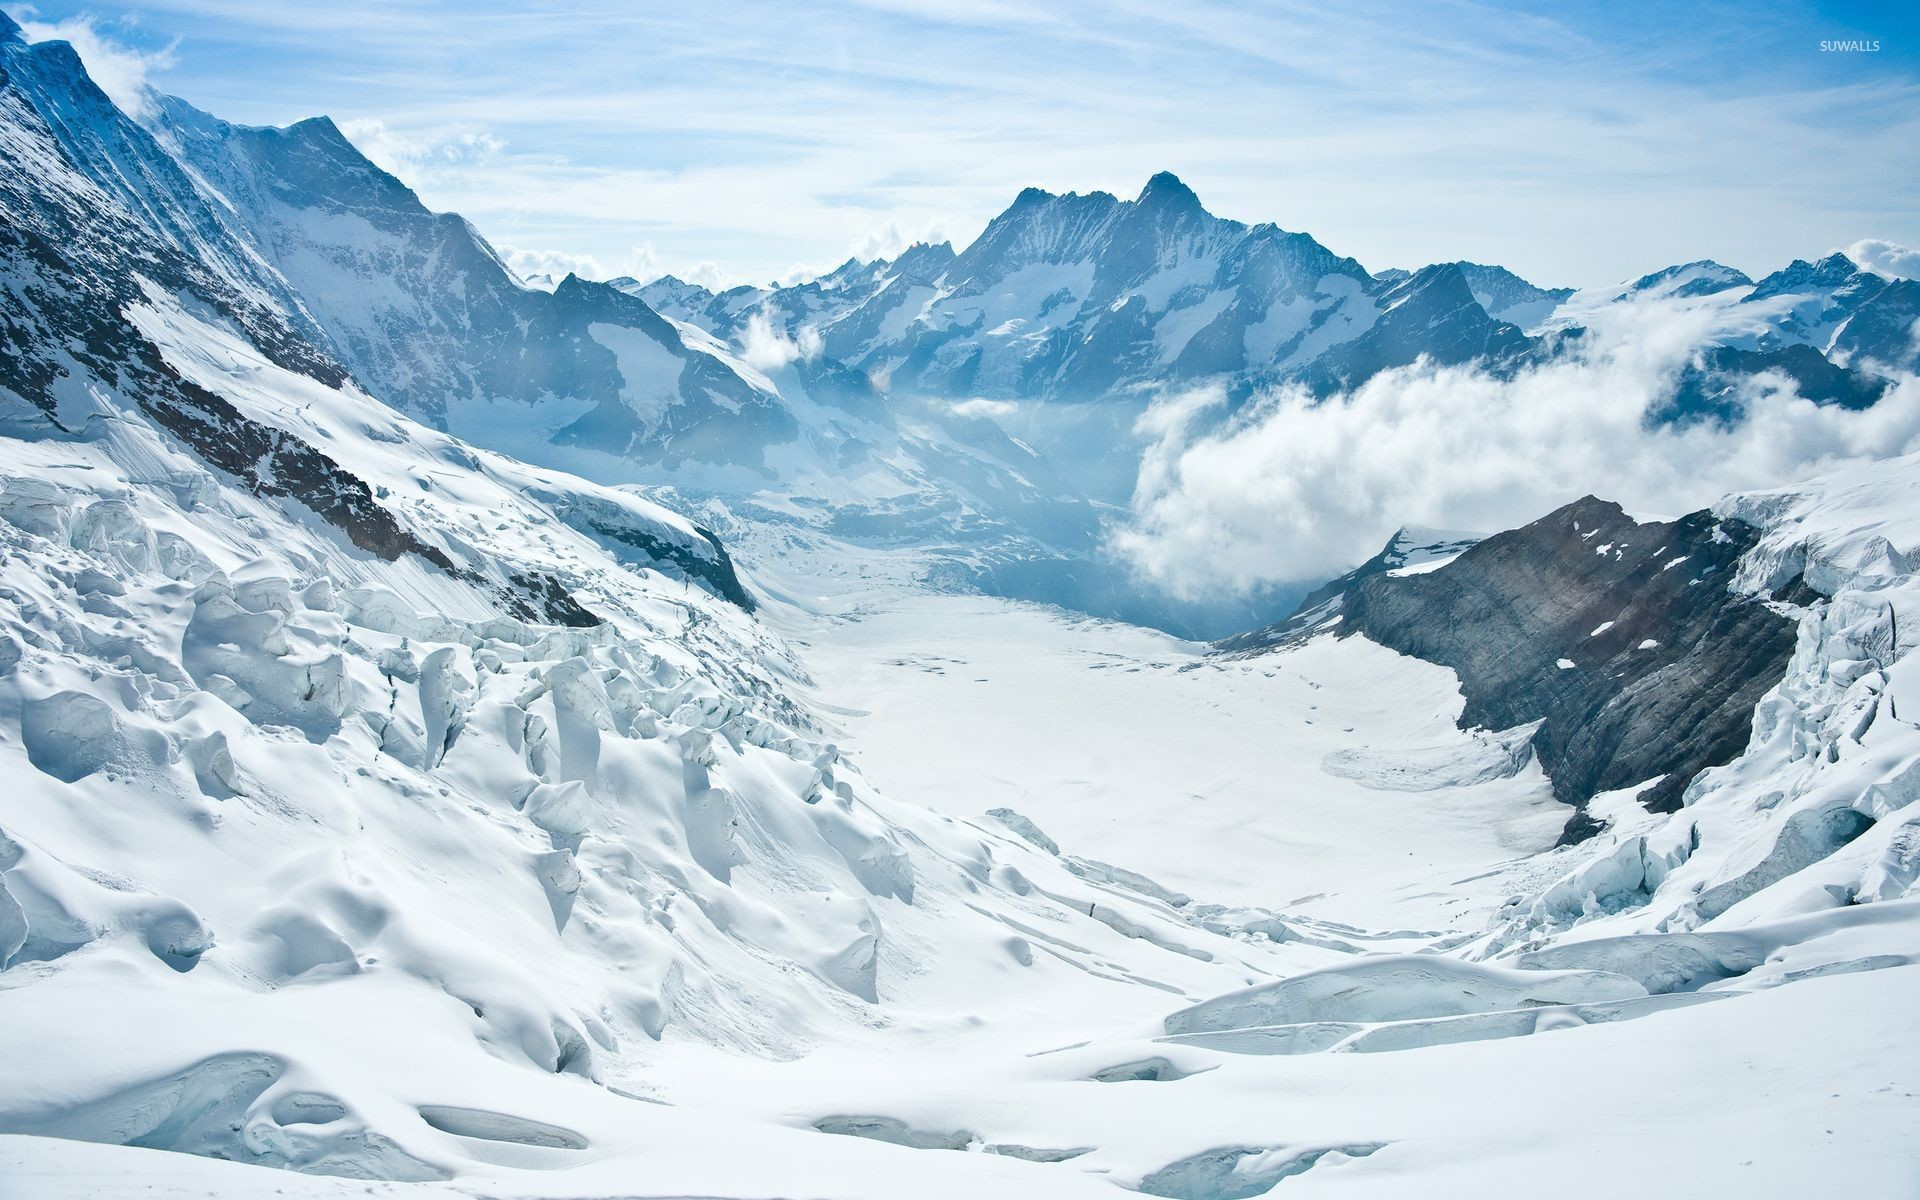 Snowy mountains [12] wallpaper